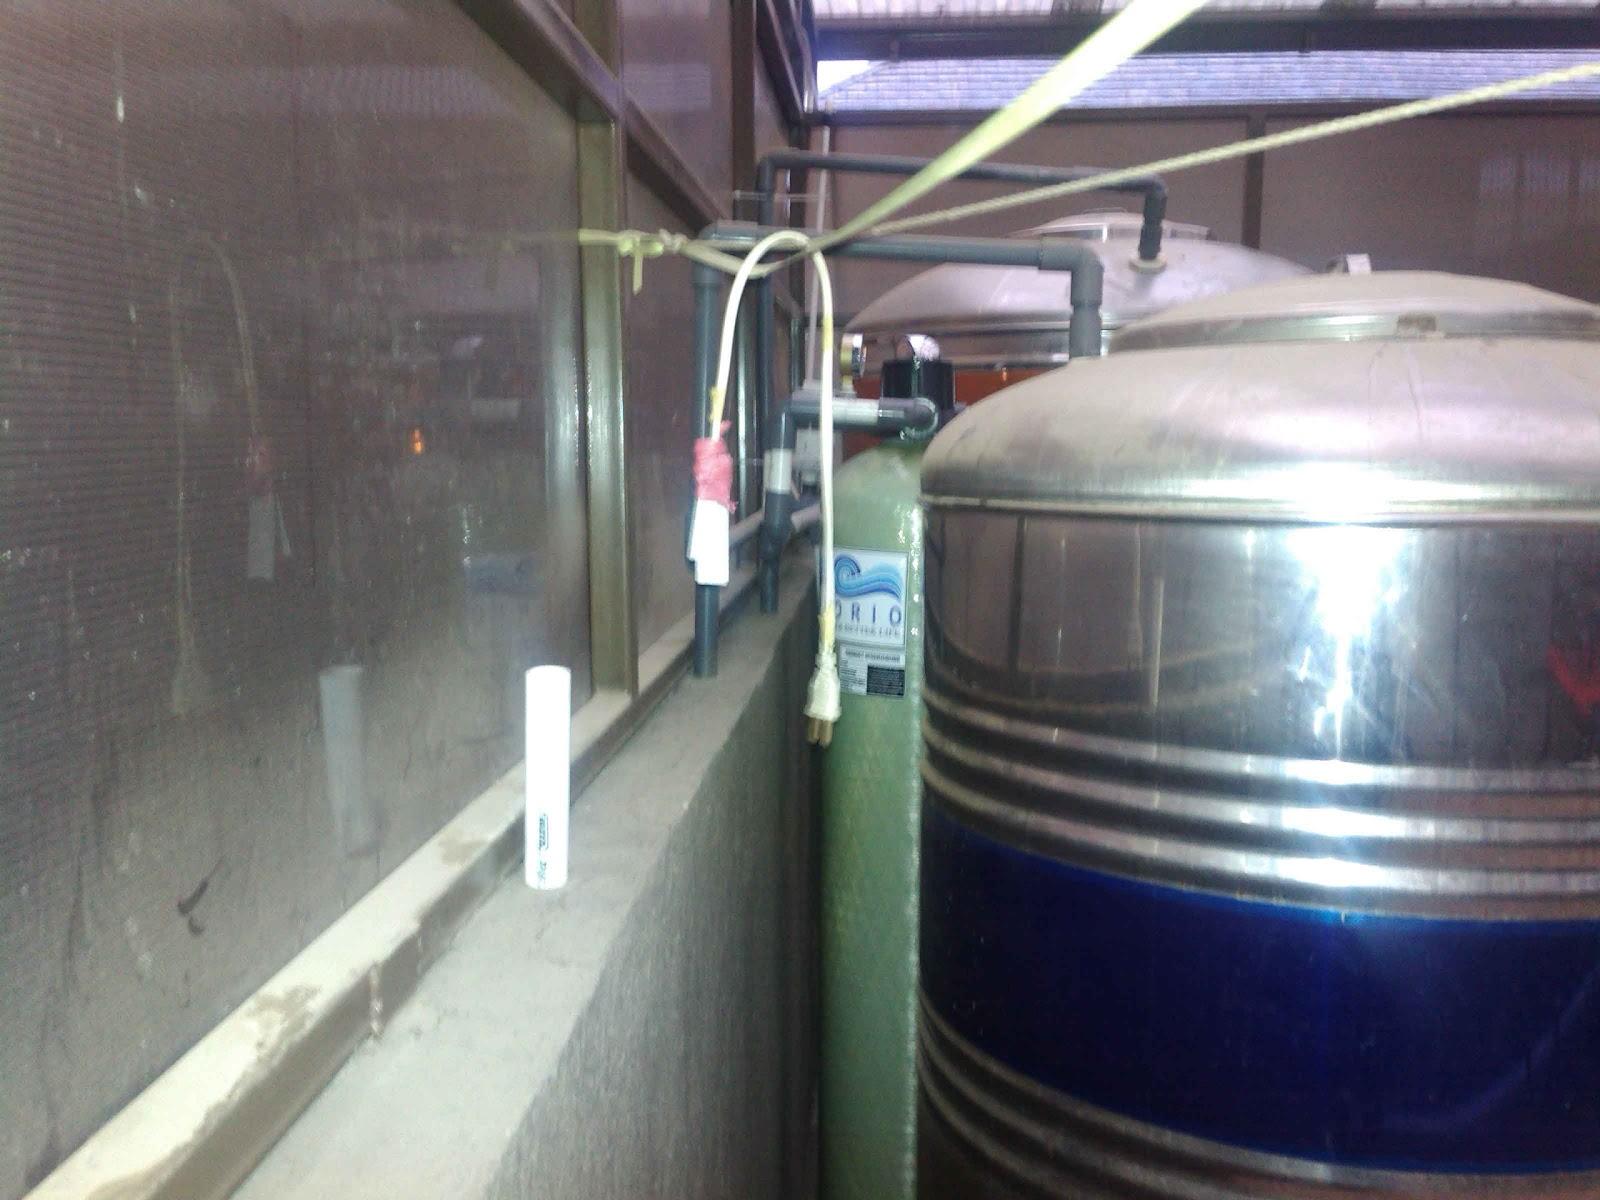 filter air cibubur, depok, jakarta, bogor, bandung, solo. harga filter air rumah tangga murah sumur bau keruh.